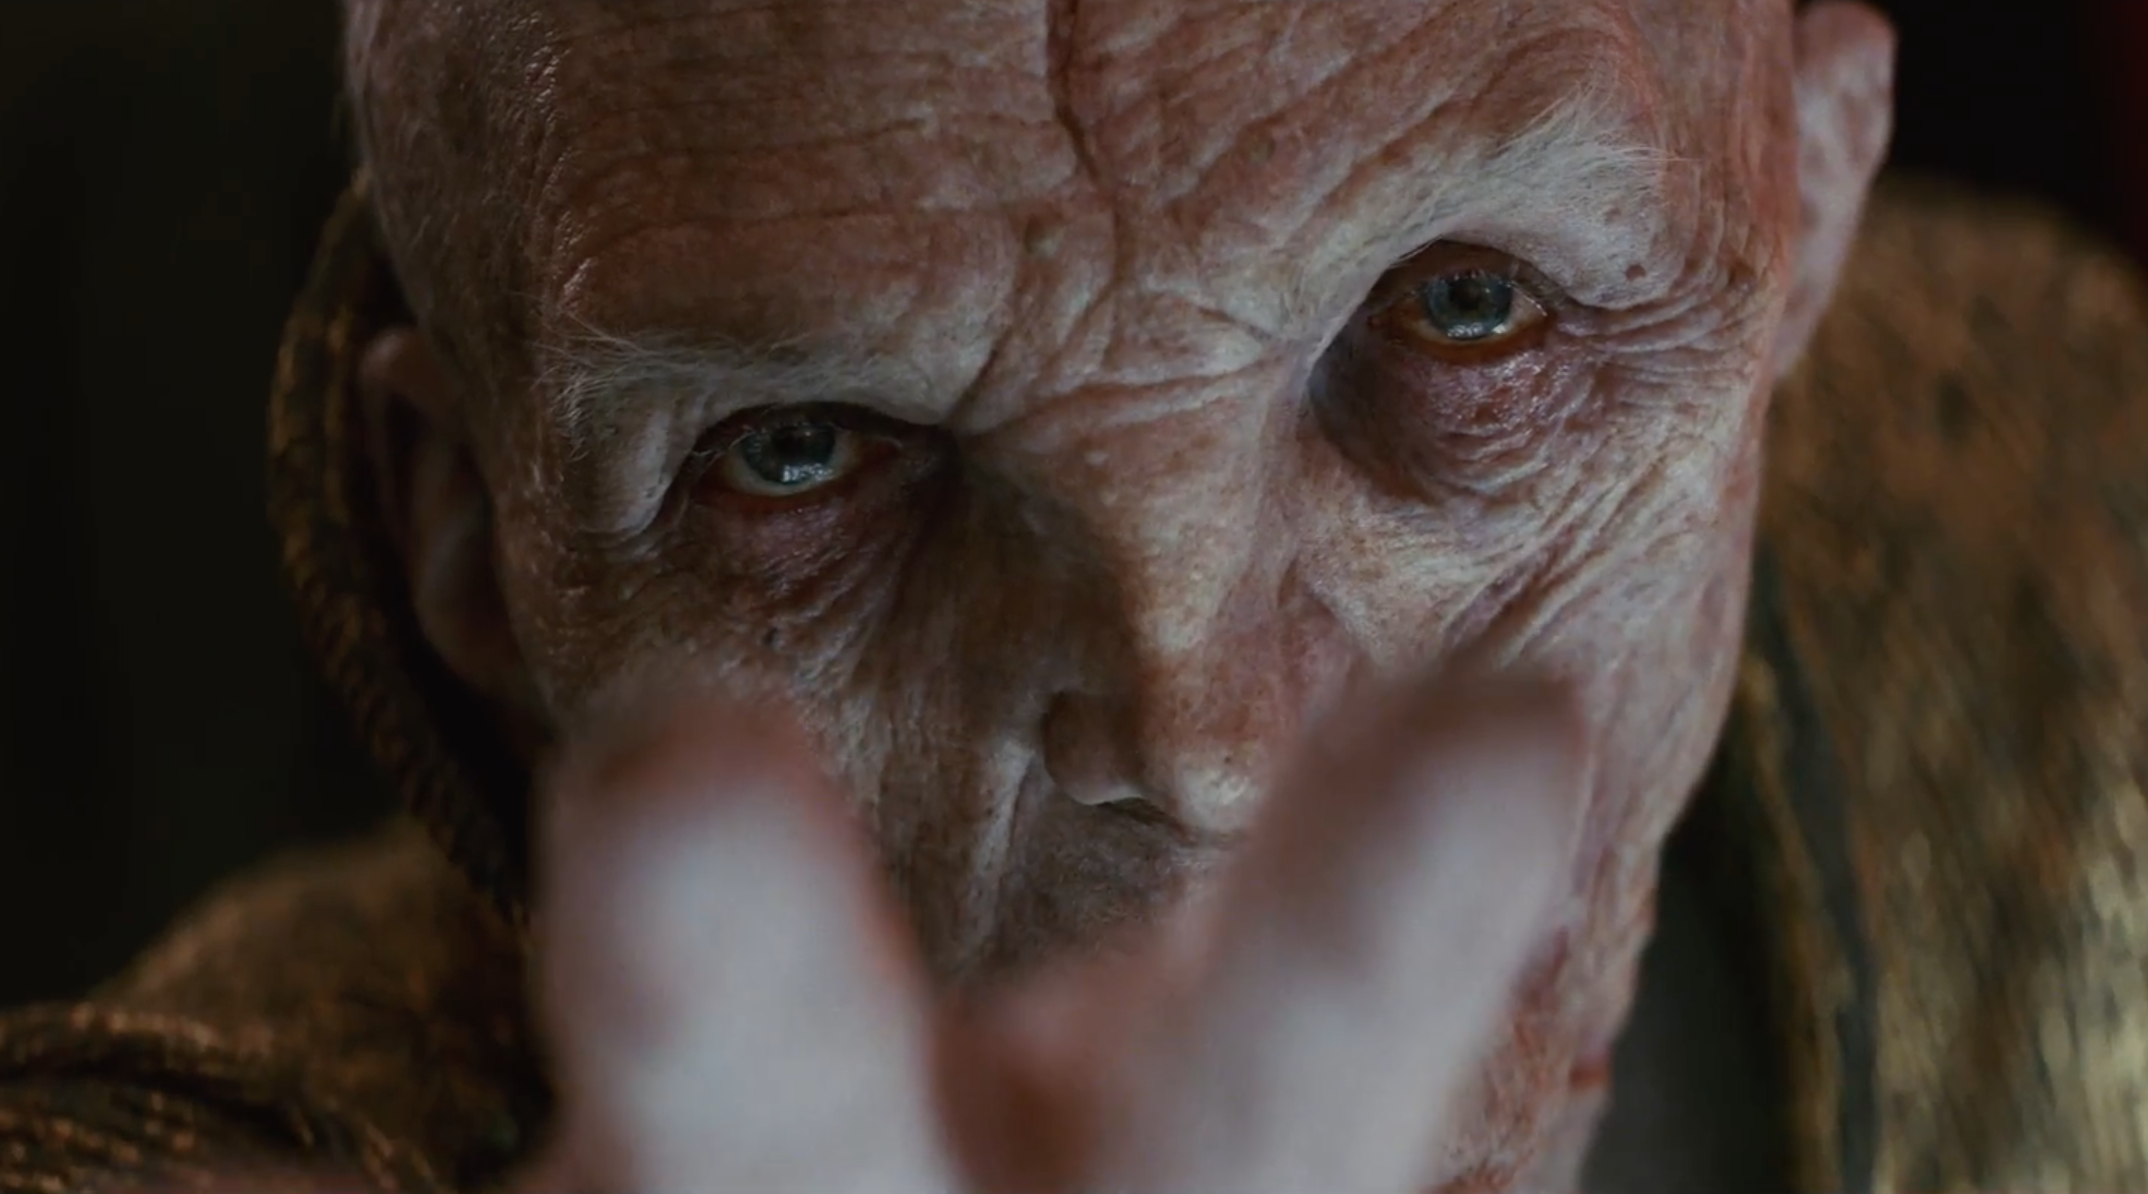 <em>The Last Jedi</em> spoiler talk: Rian Johnson on Supreme Leader Snoke's startling scenes